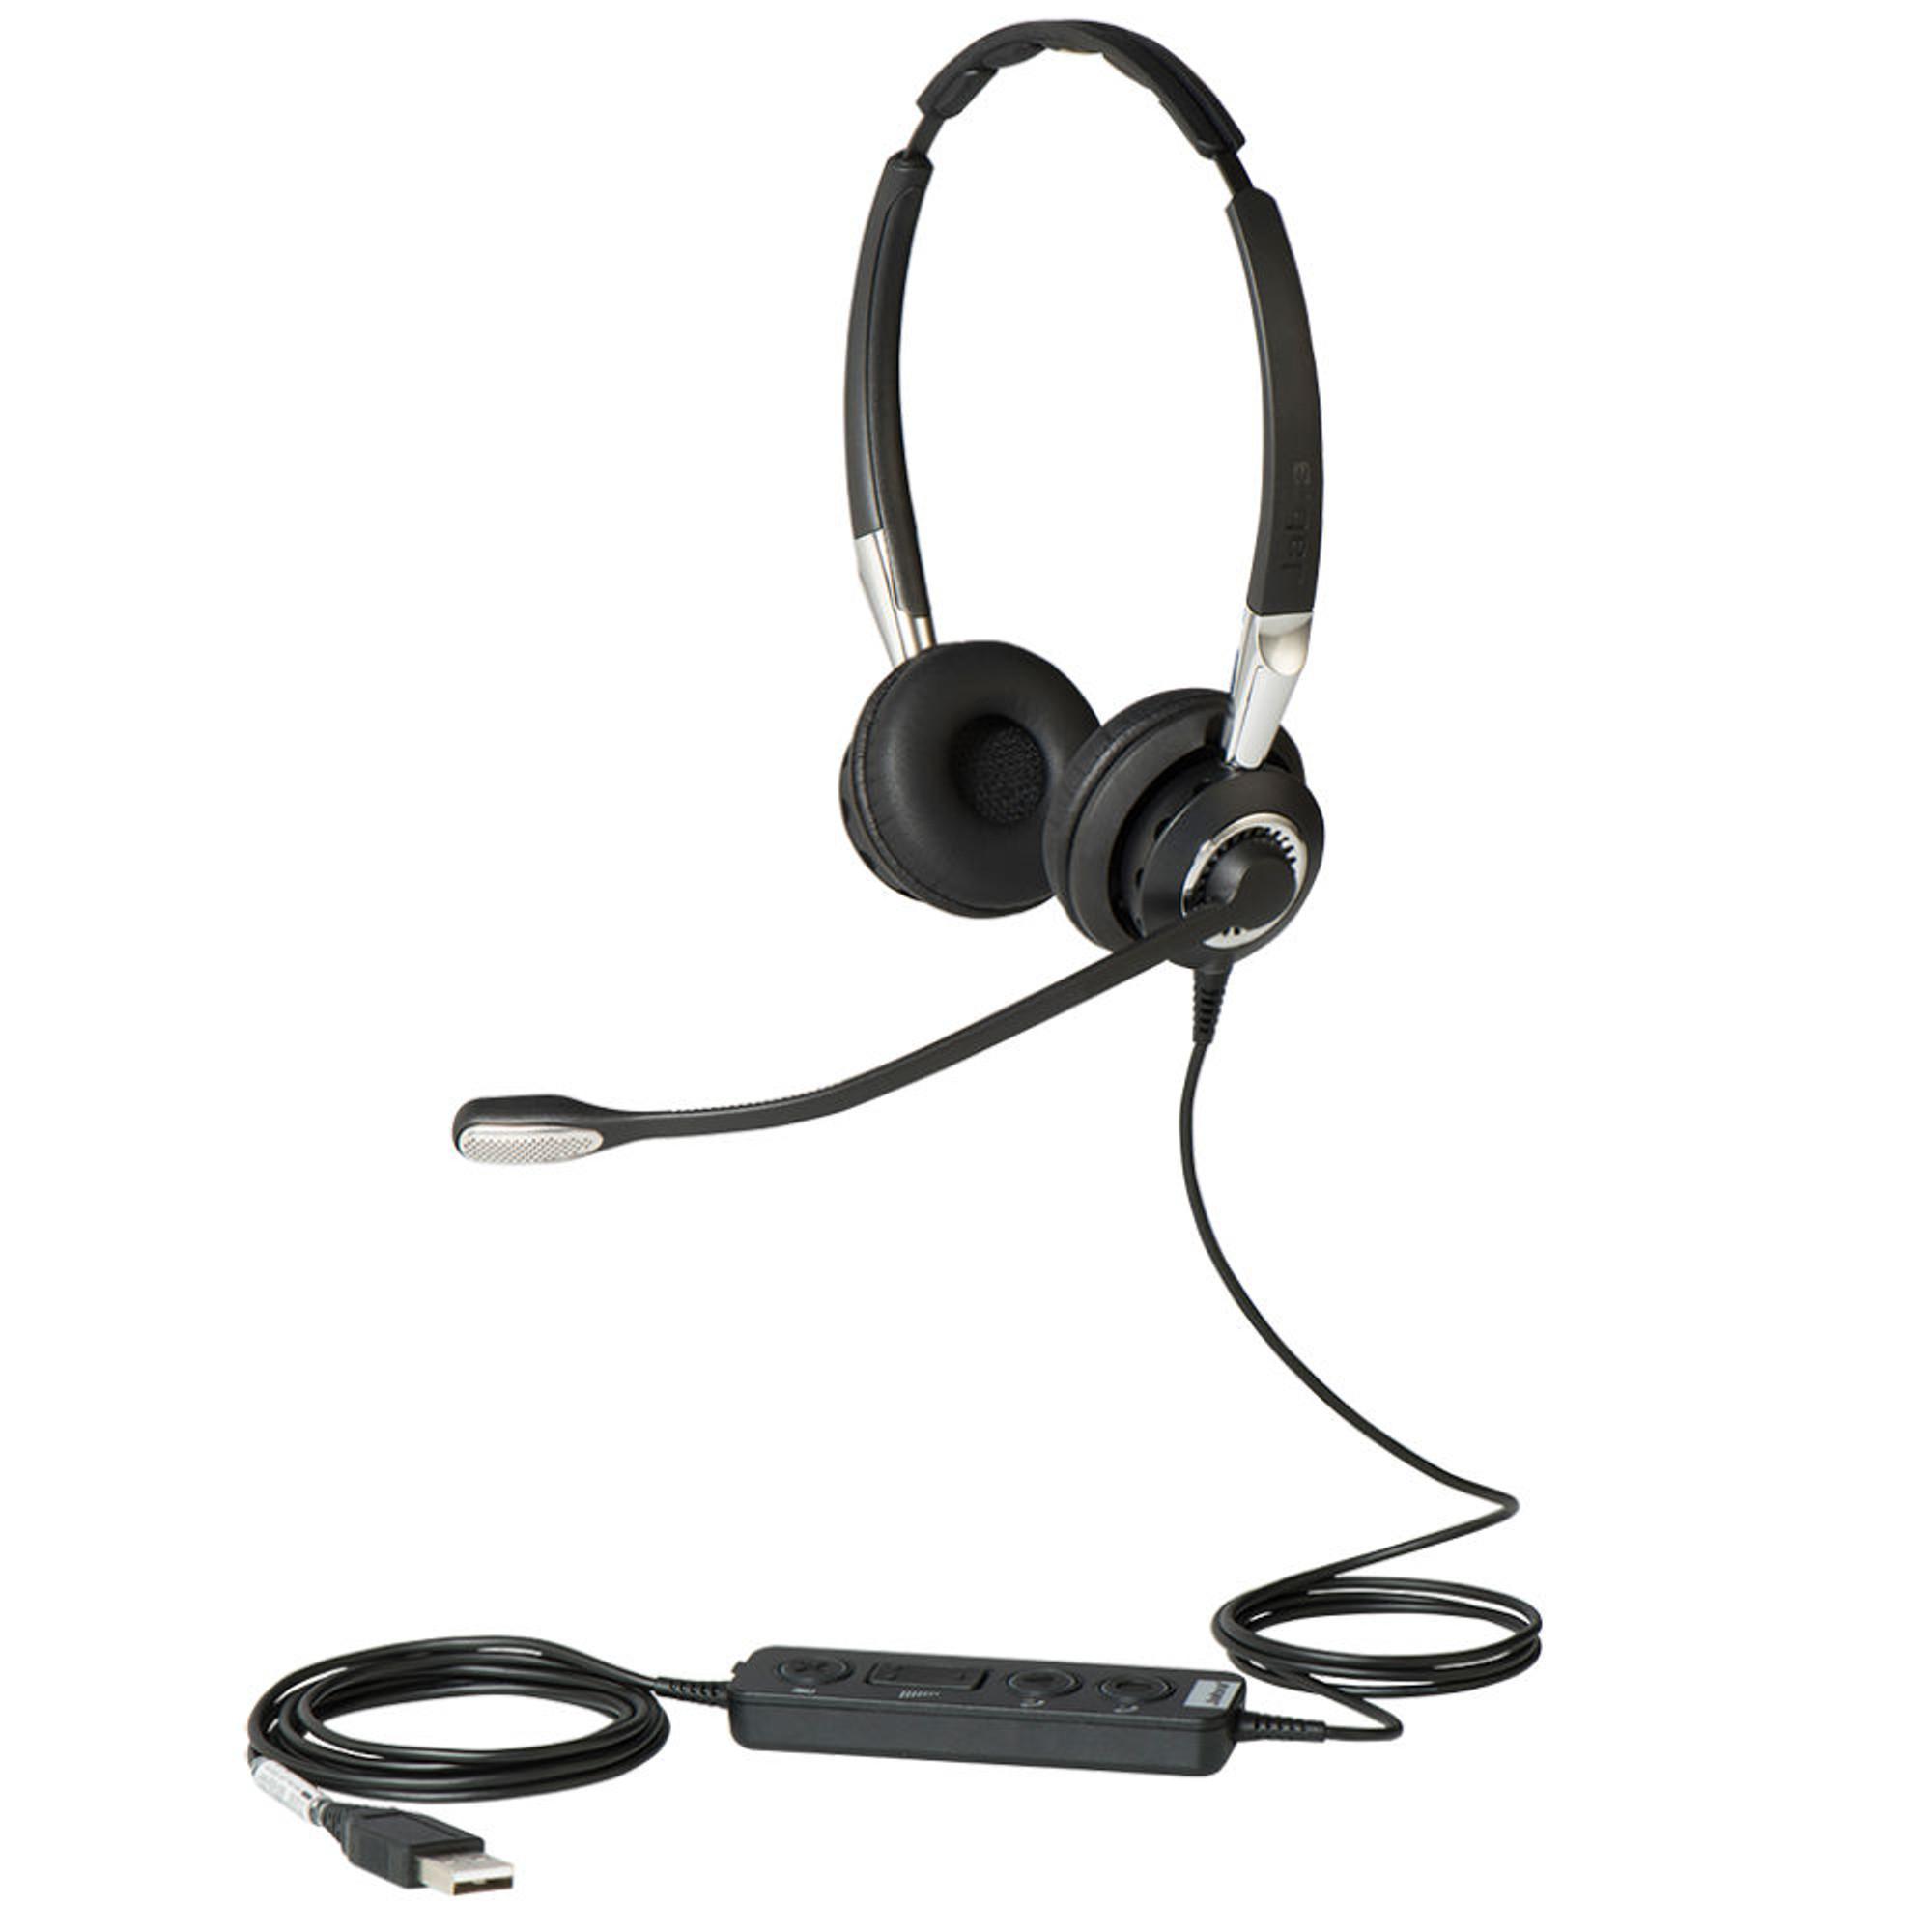 6e26571e1d5 Jabra Headset Singapore | Jabra Biz 2400 II MS Duo Corded Headset ...